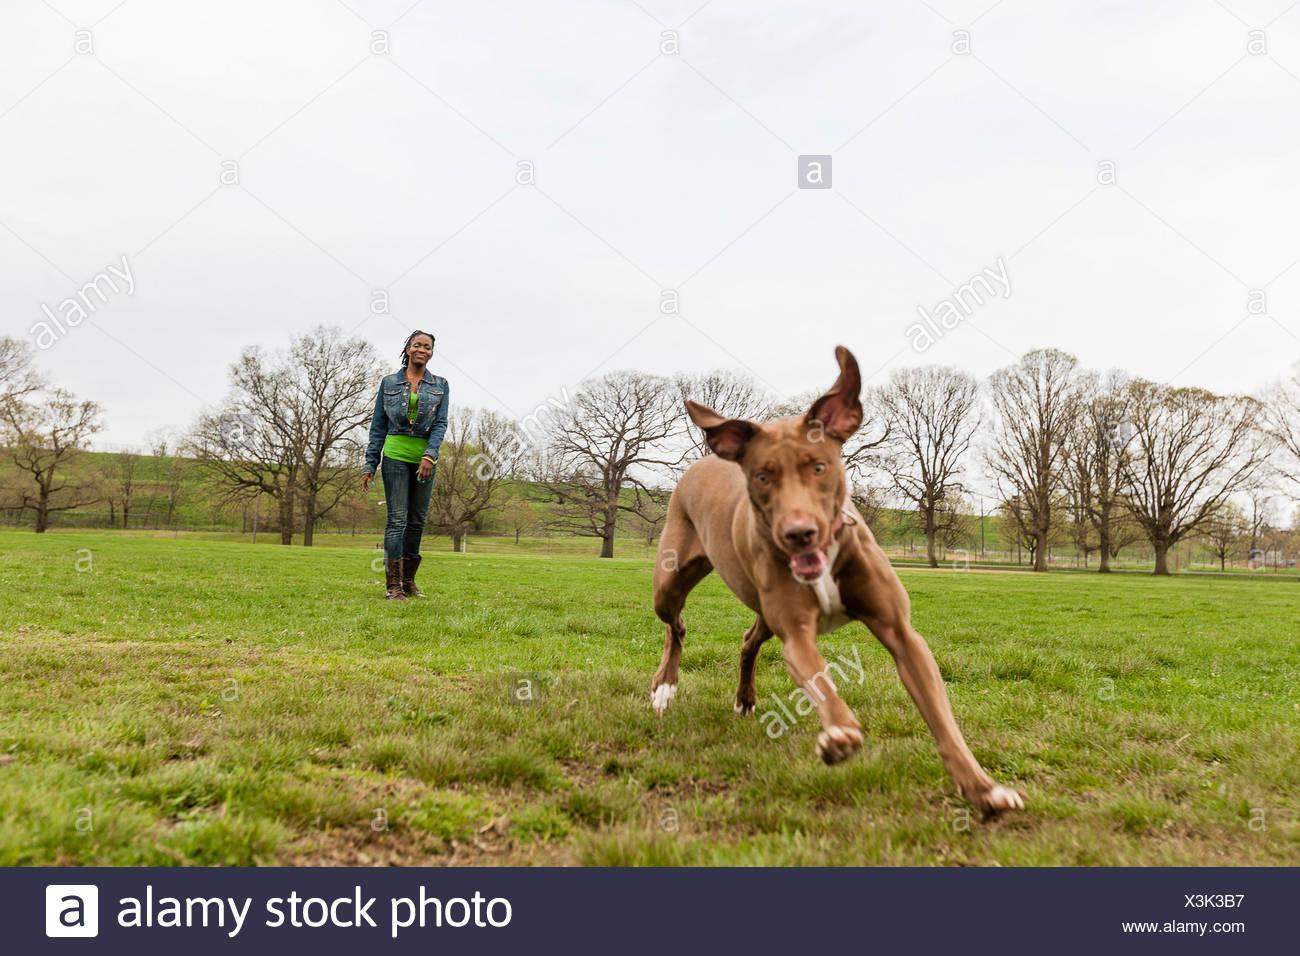 Dog running across grass - Stock Image